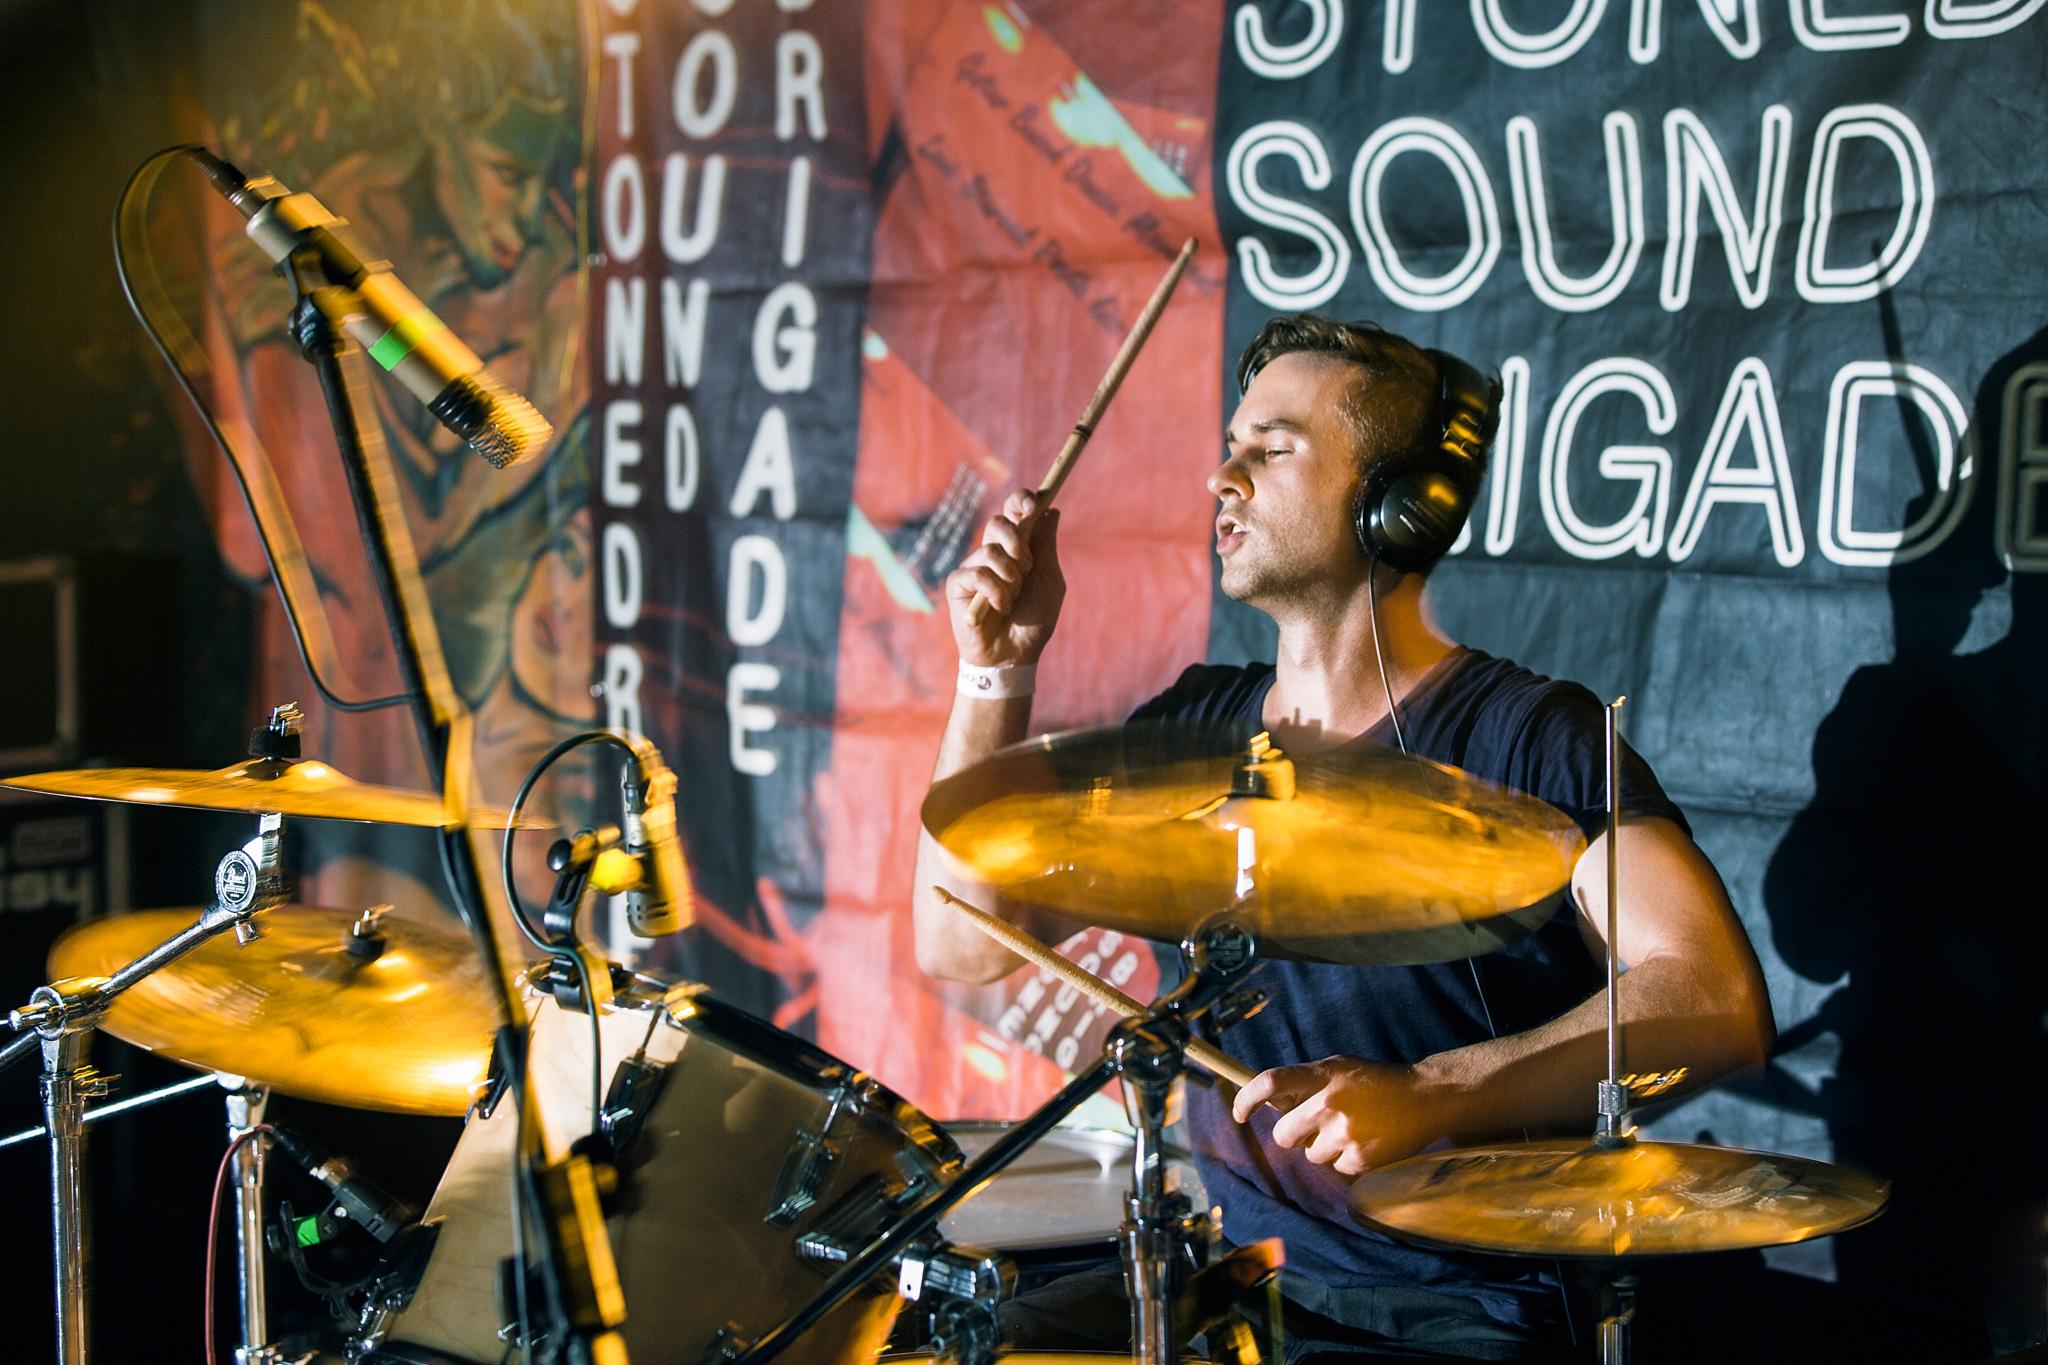 english indie band playing at sage club berlin